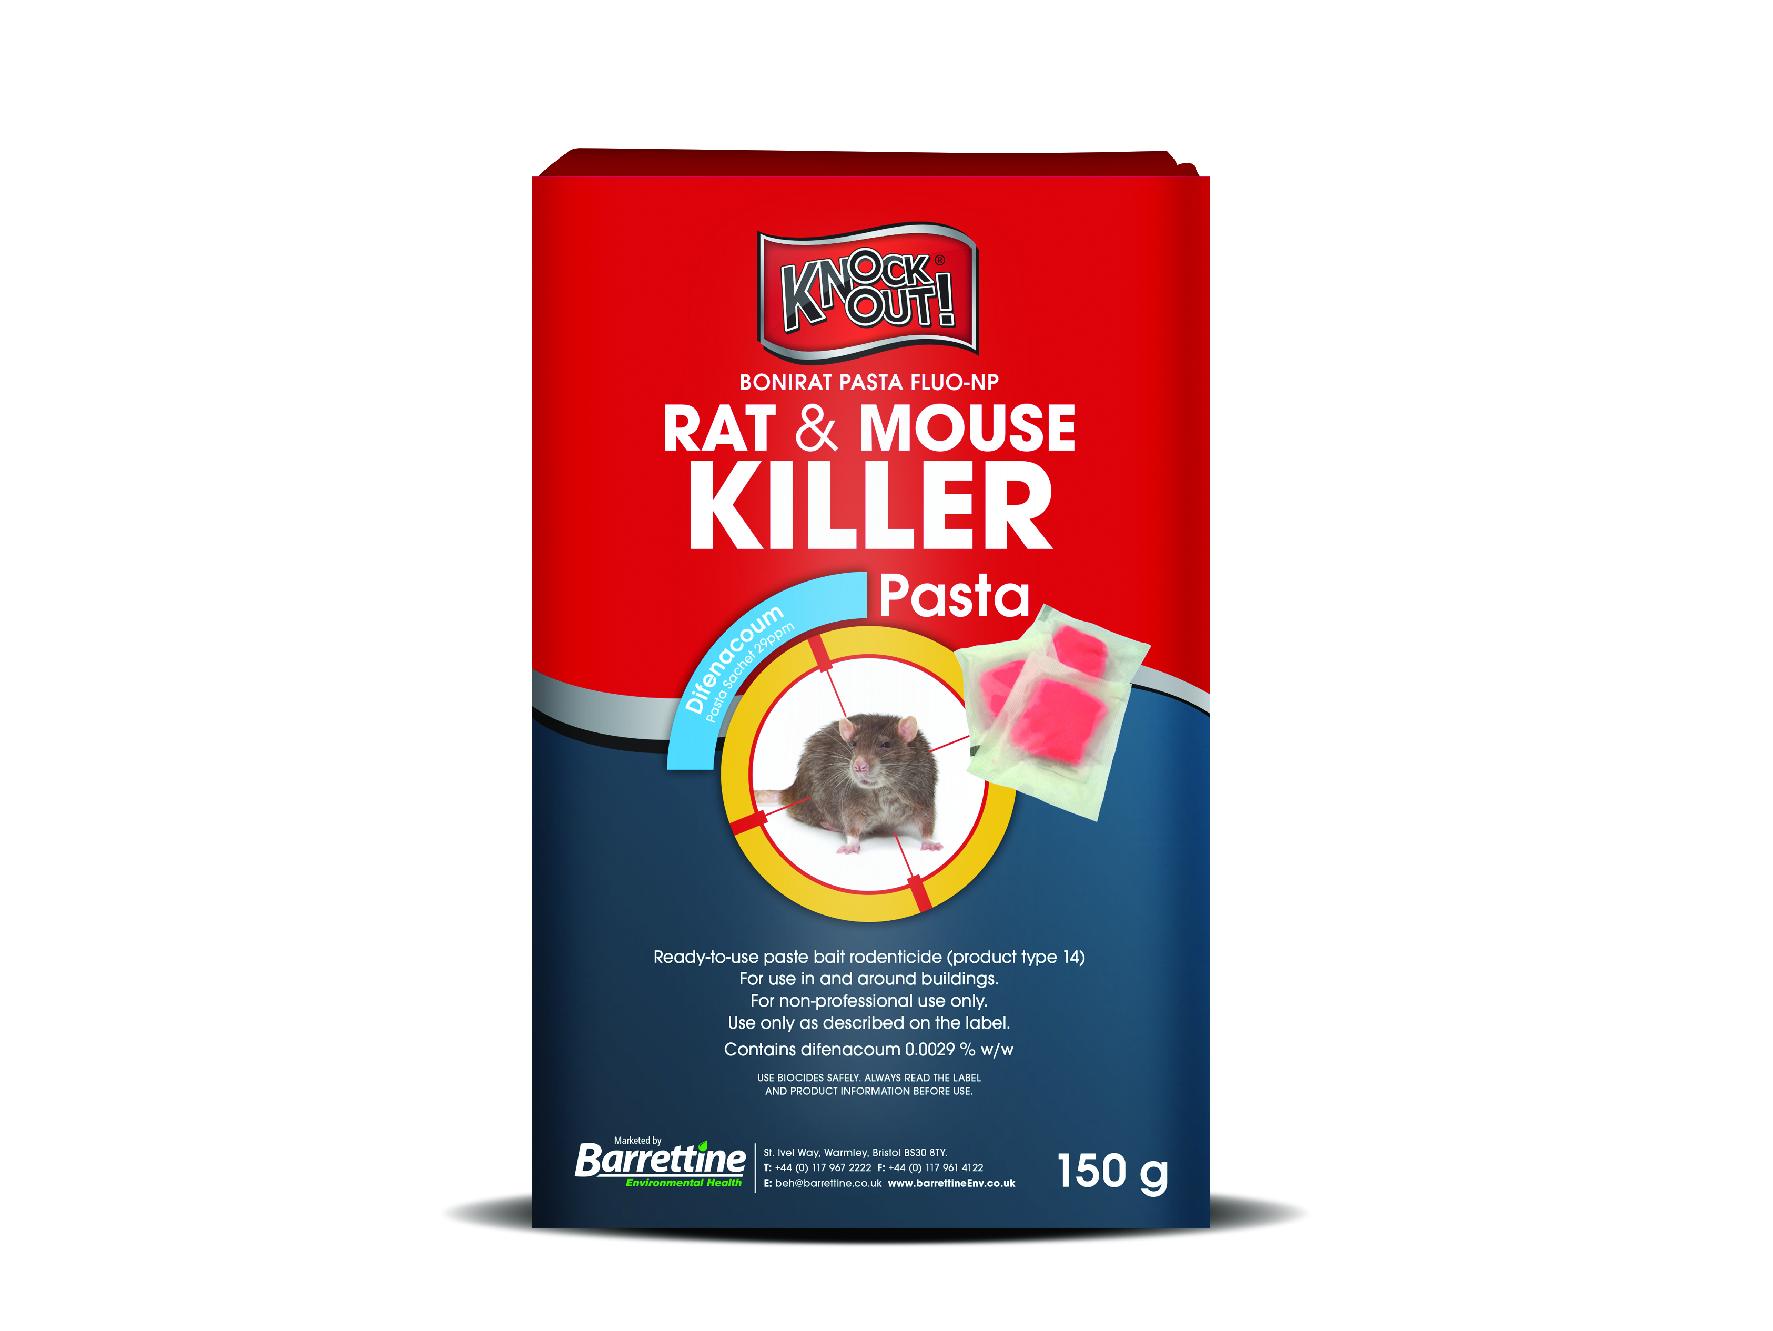 Pest Control Barrettine Products